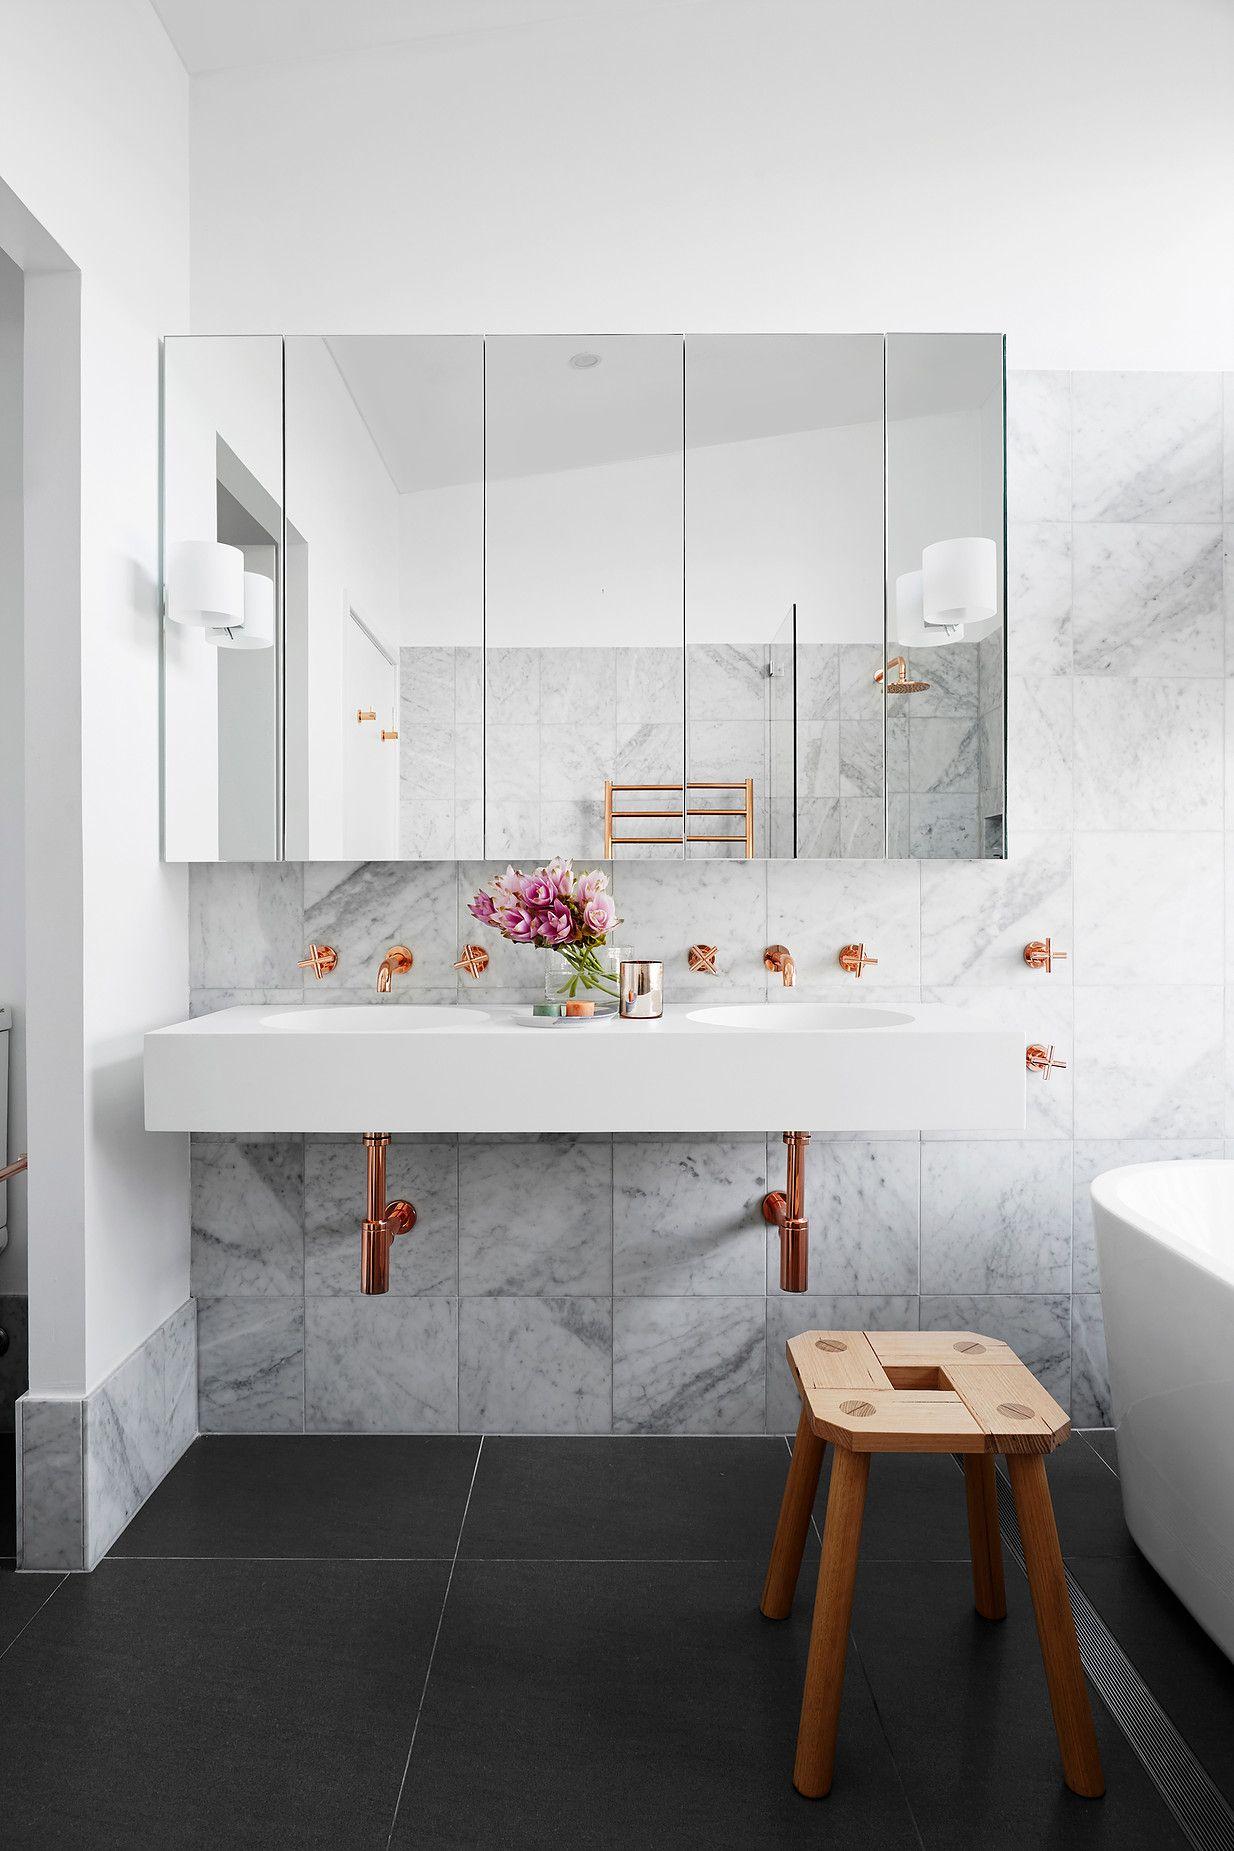 Horton & Co interior designer newcastle   RESIDENTIAL   Bathrooms ...